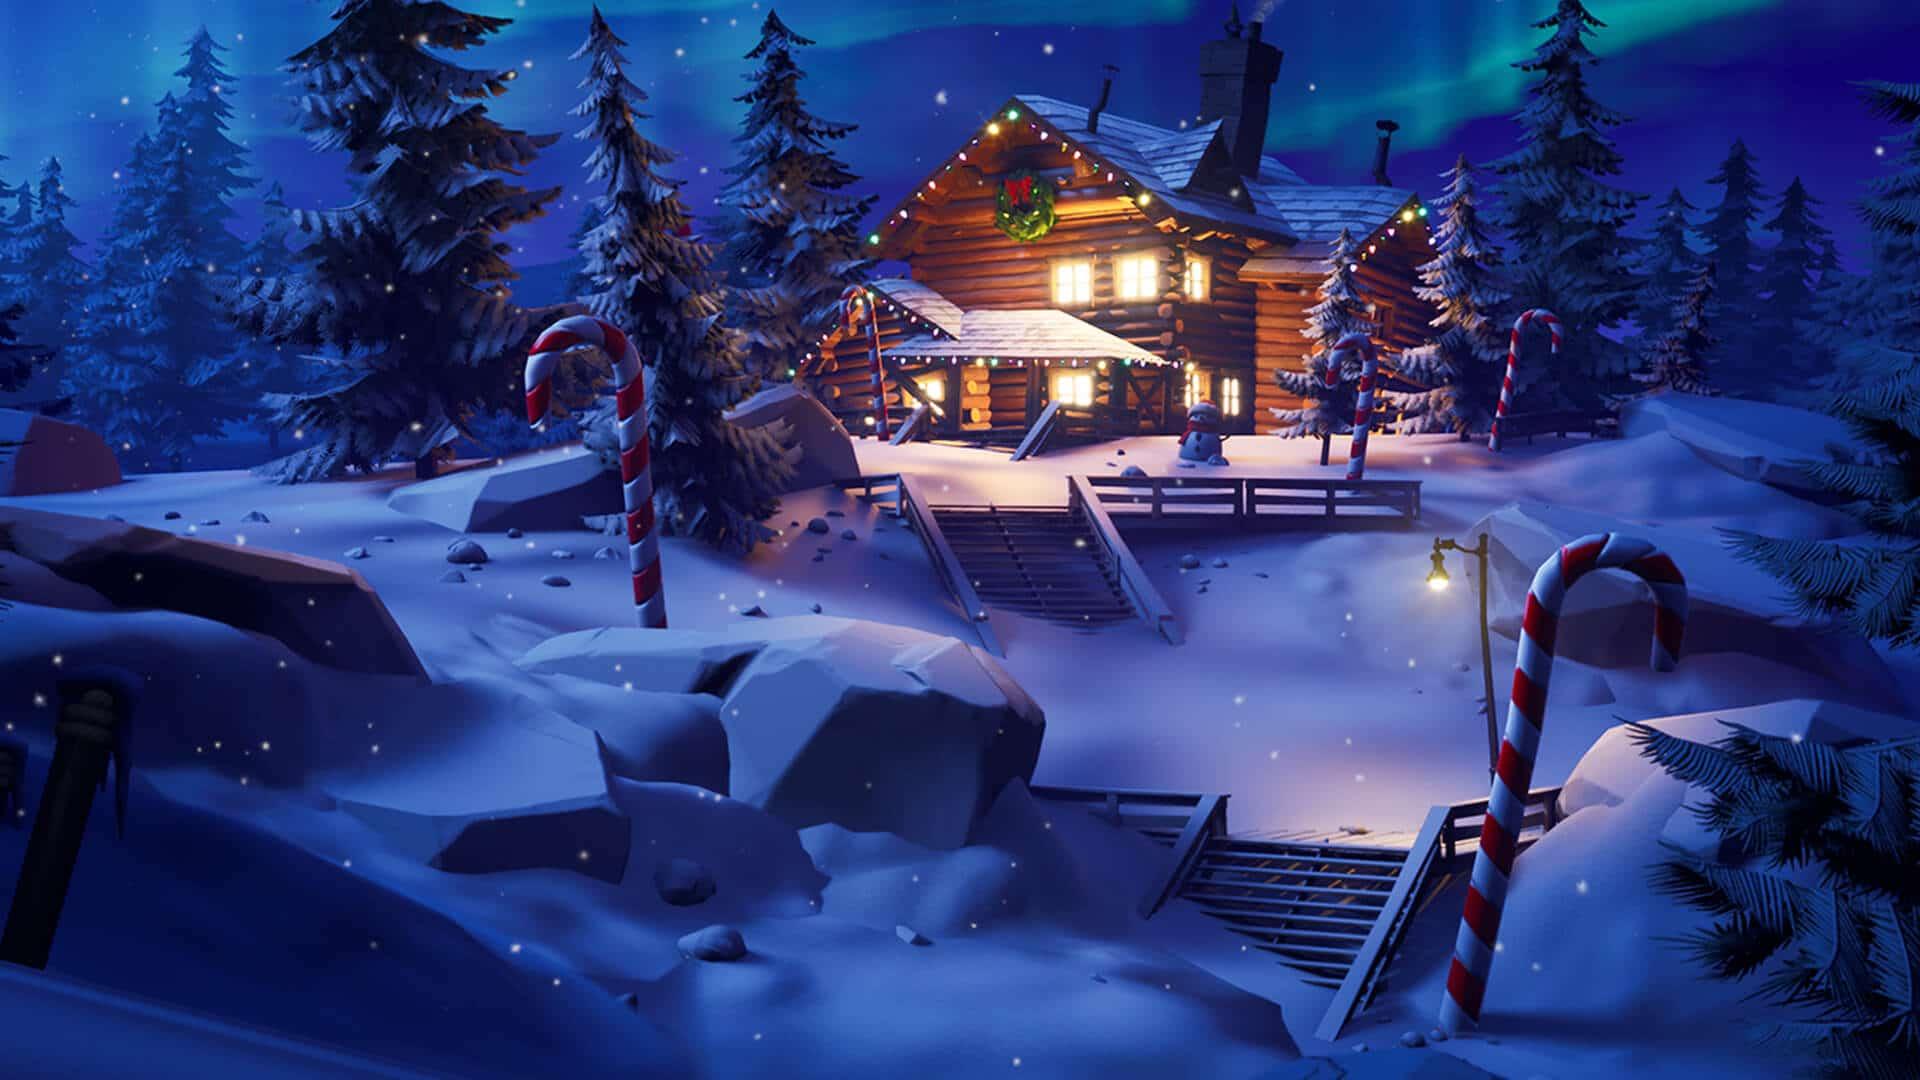 Evento navideño de Fortnite Winterfest